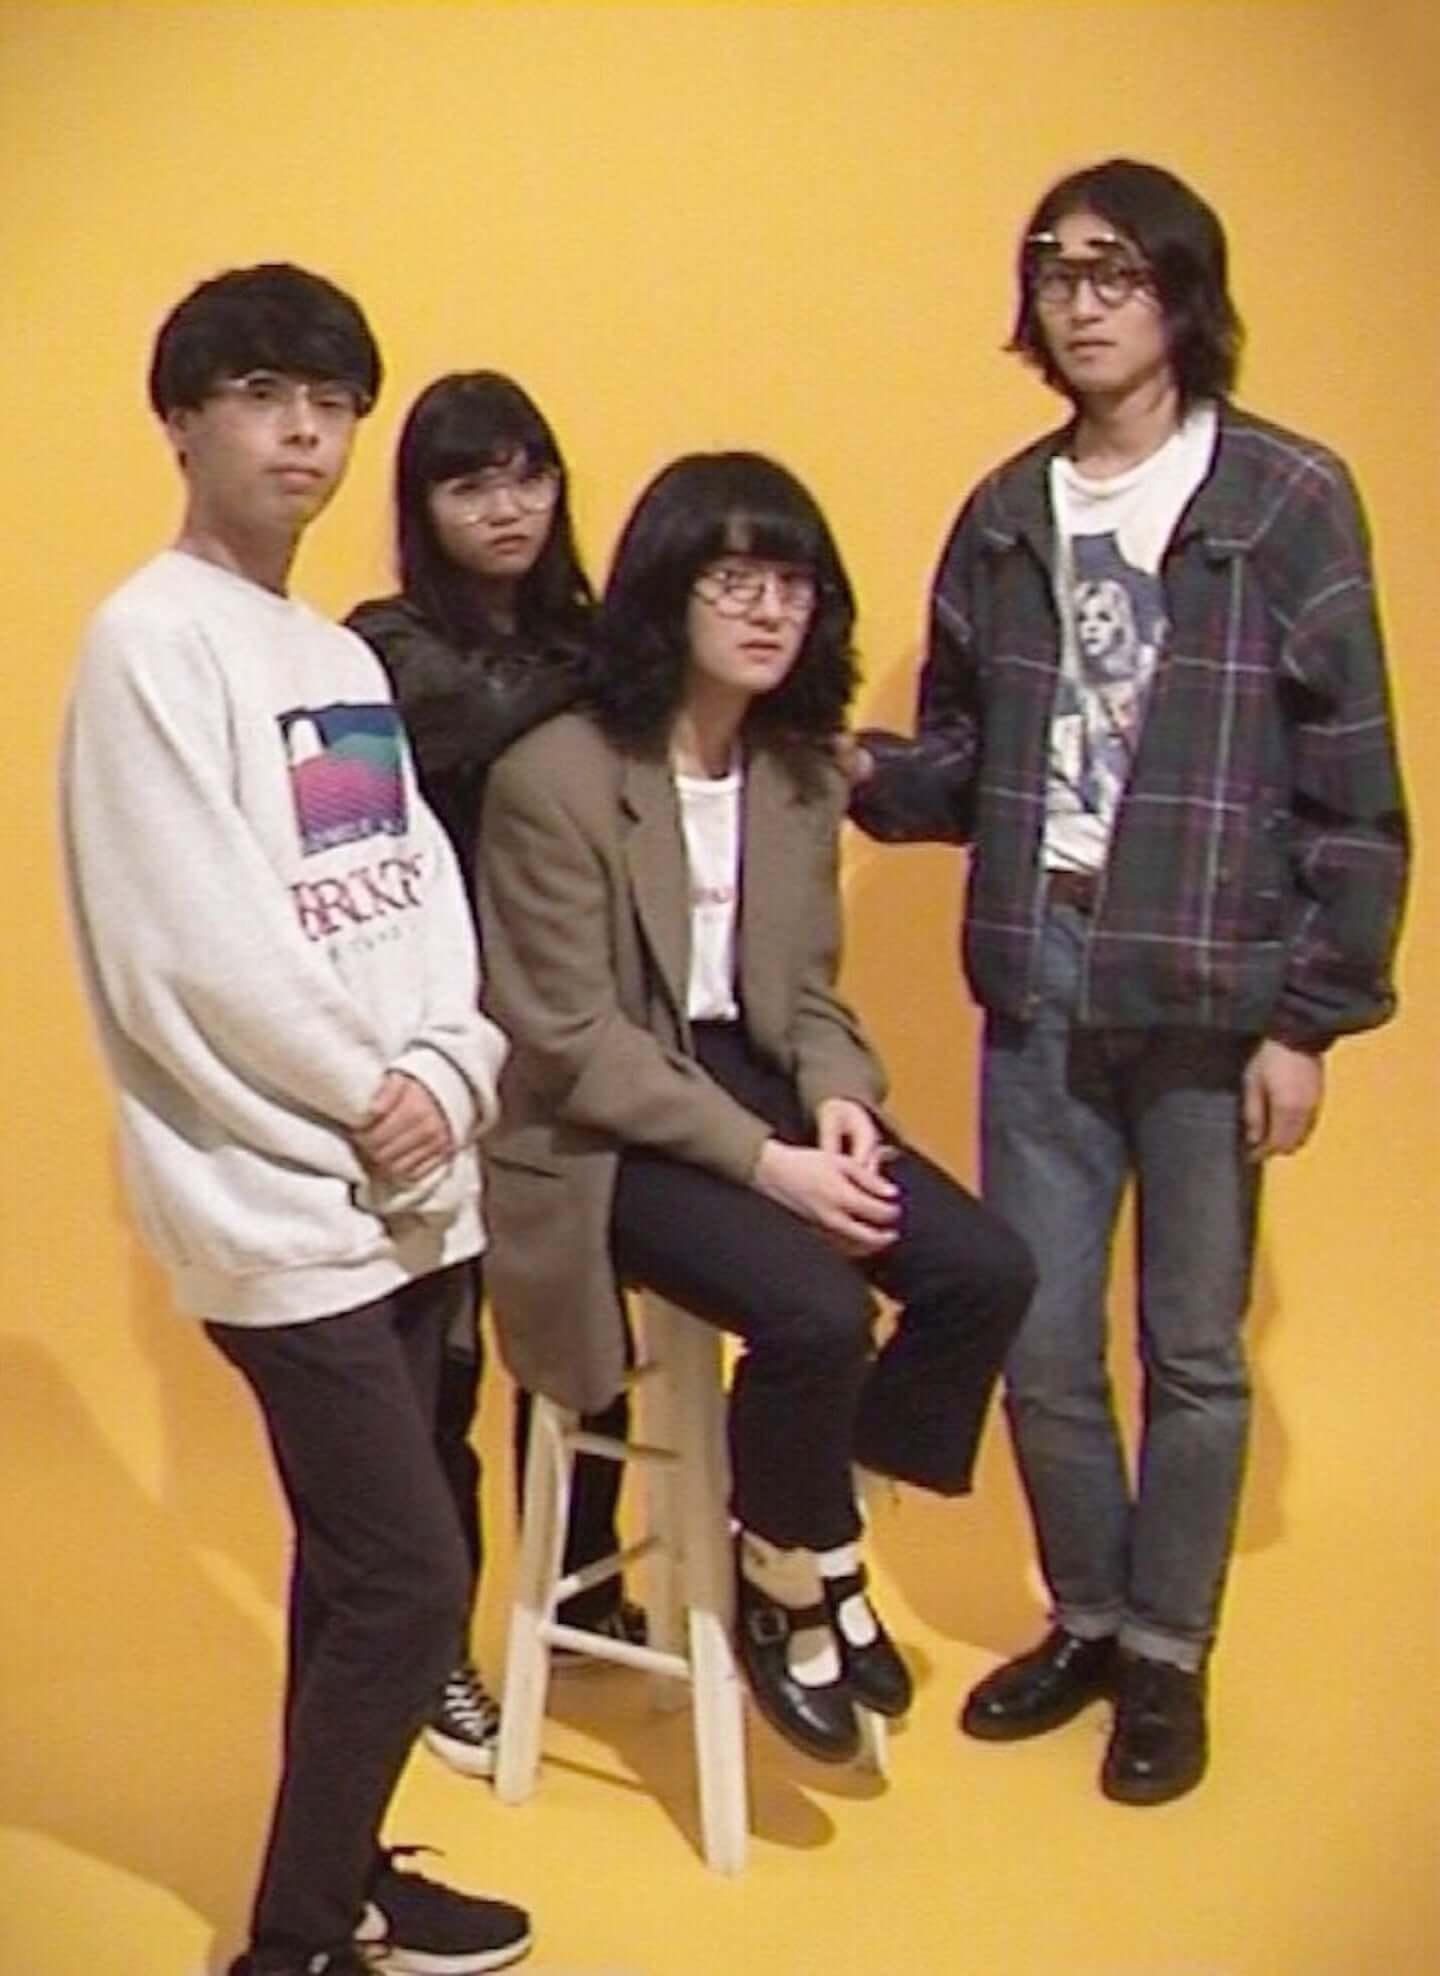 No Busesが1st Full Album『Boys Loved Her』のリリースに先駆け、「Trying Trying」のミュージックビデオを公開 nobuses1-1440x1976